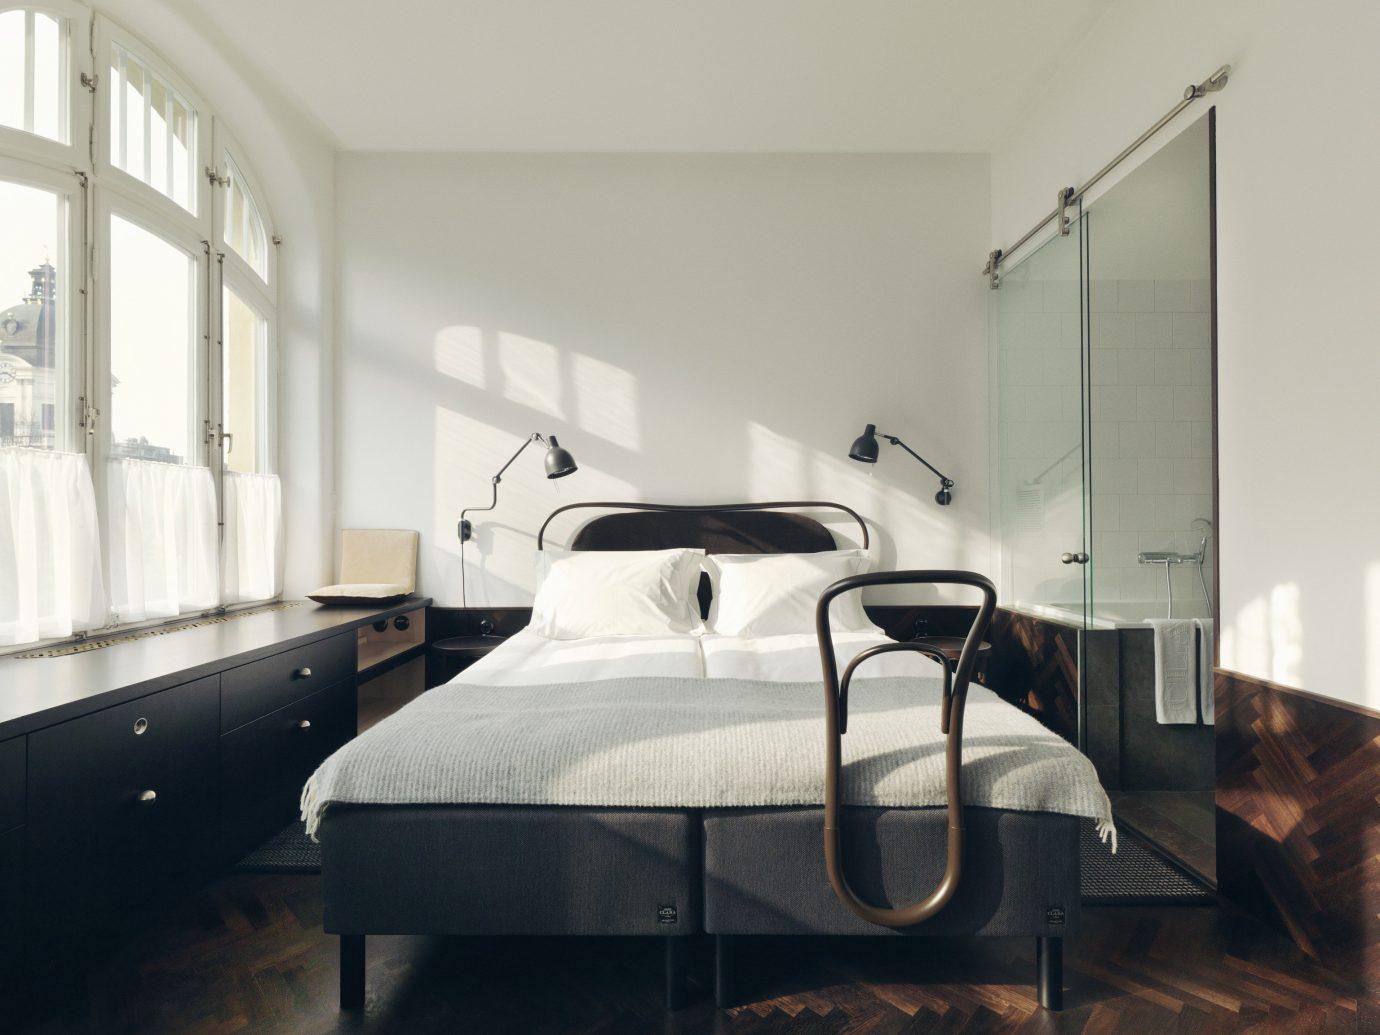 Hotels Stockholm Sweden indoor wall floor bed frame furniture room bed Architecture window interior design mattress product design Bedroom